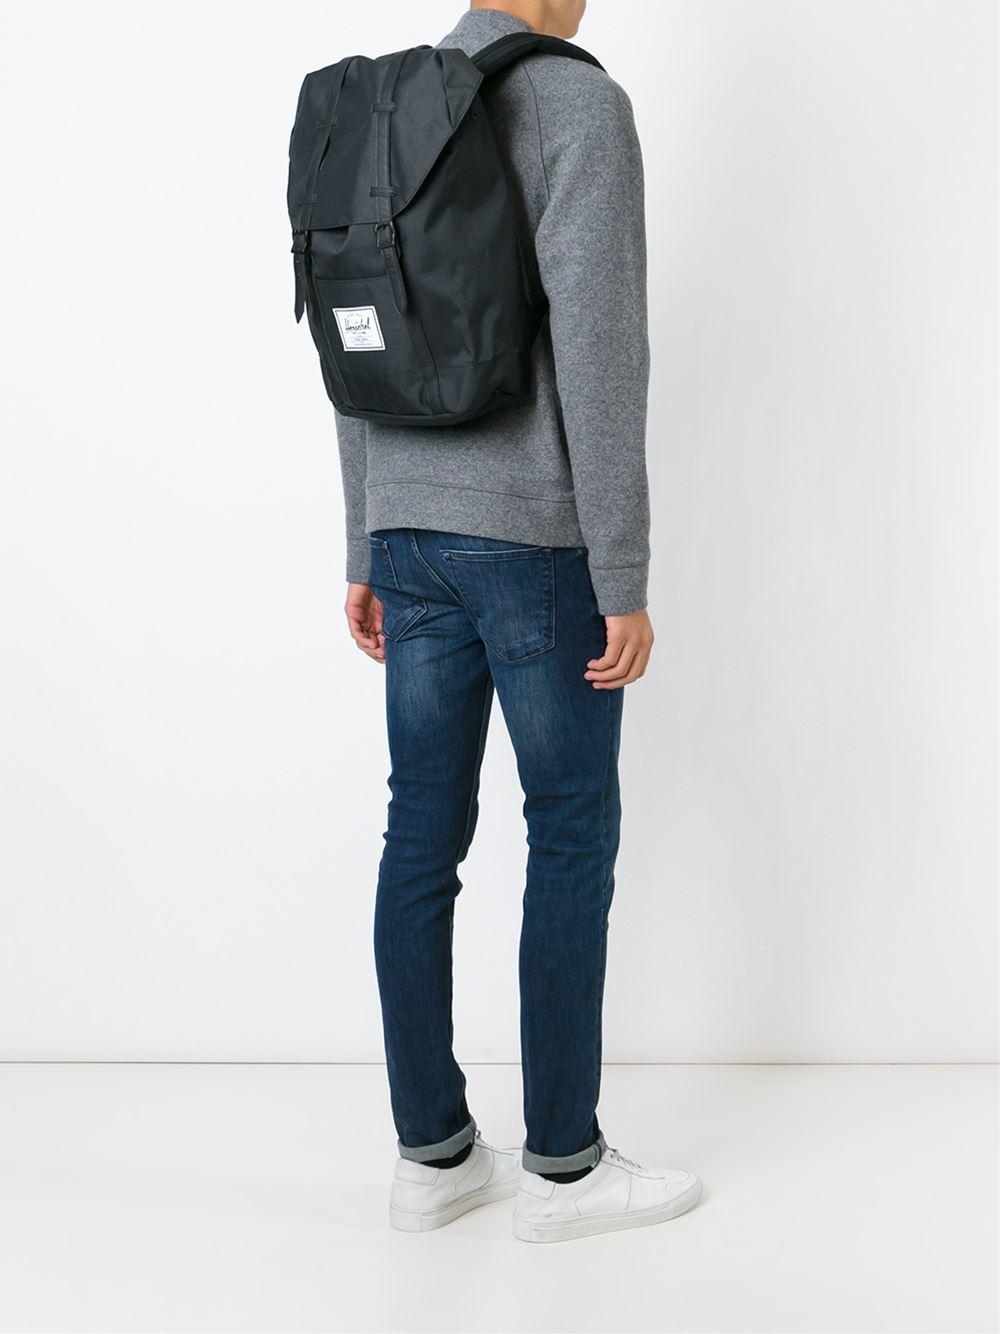 Lyst - Herschel Supply Co. Retreat Backpack in Black for Men bd521e7b6c